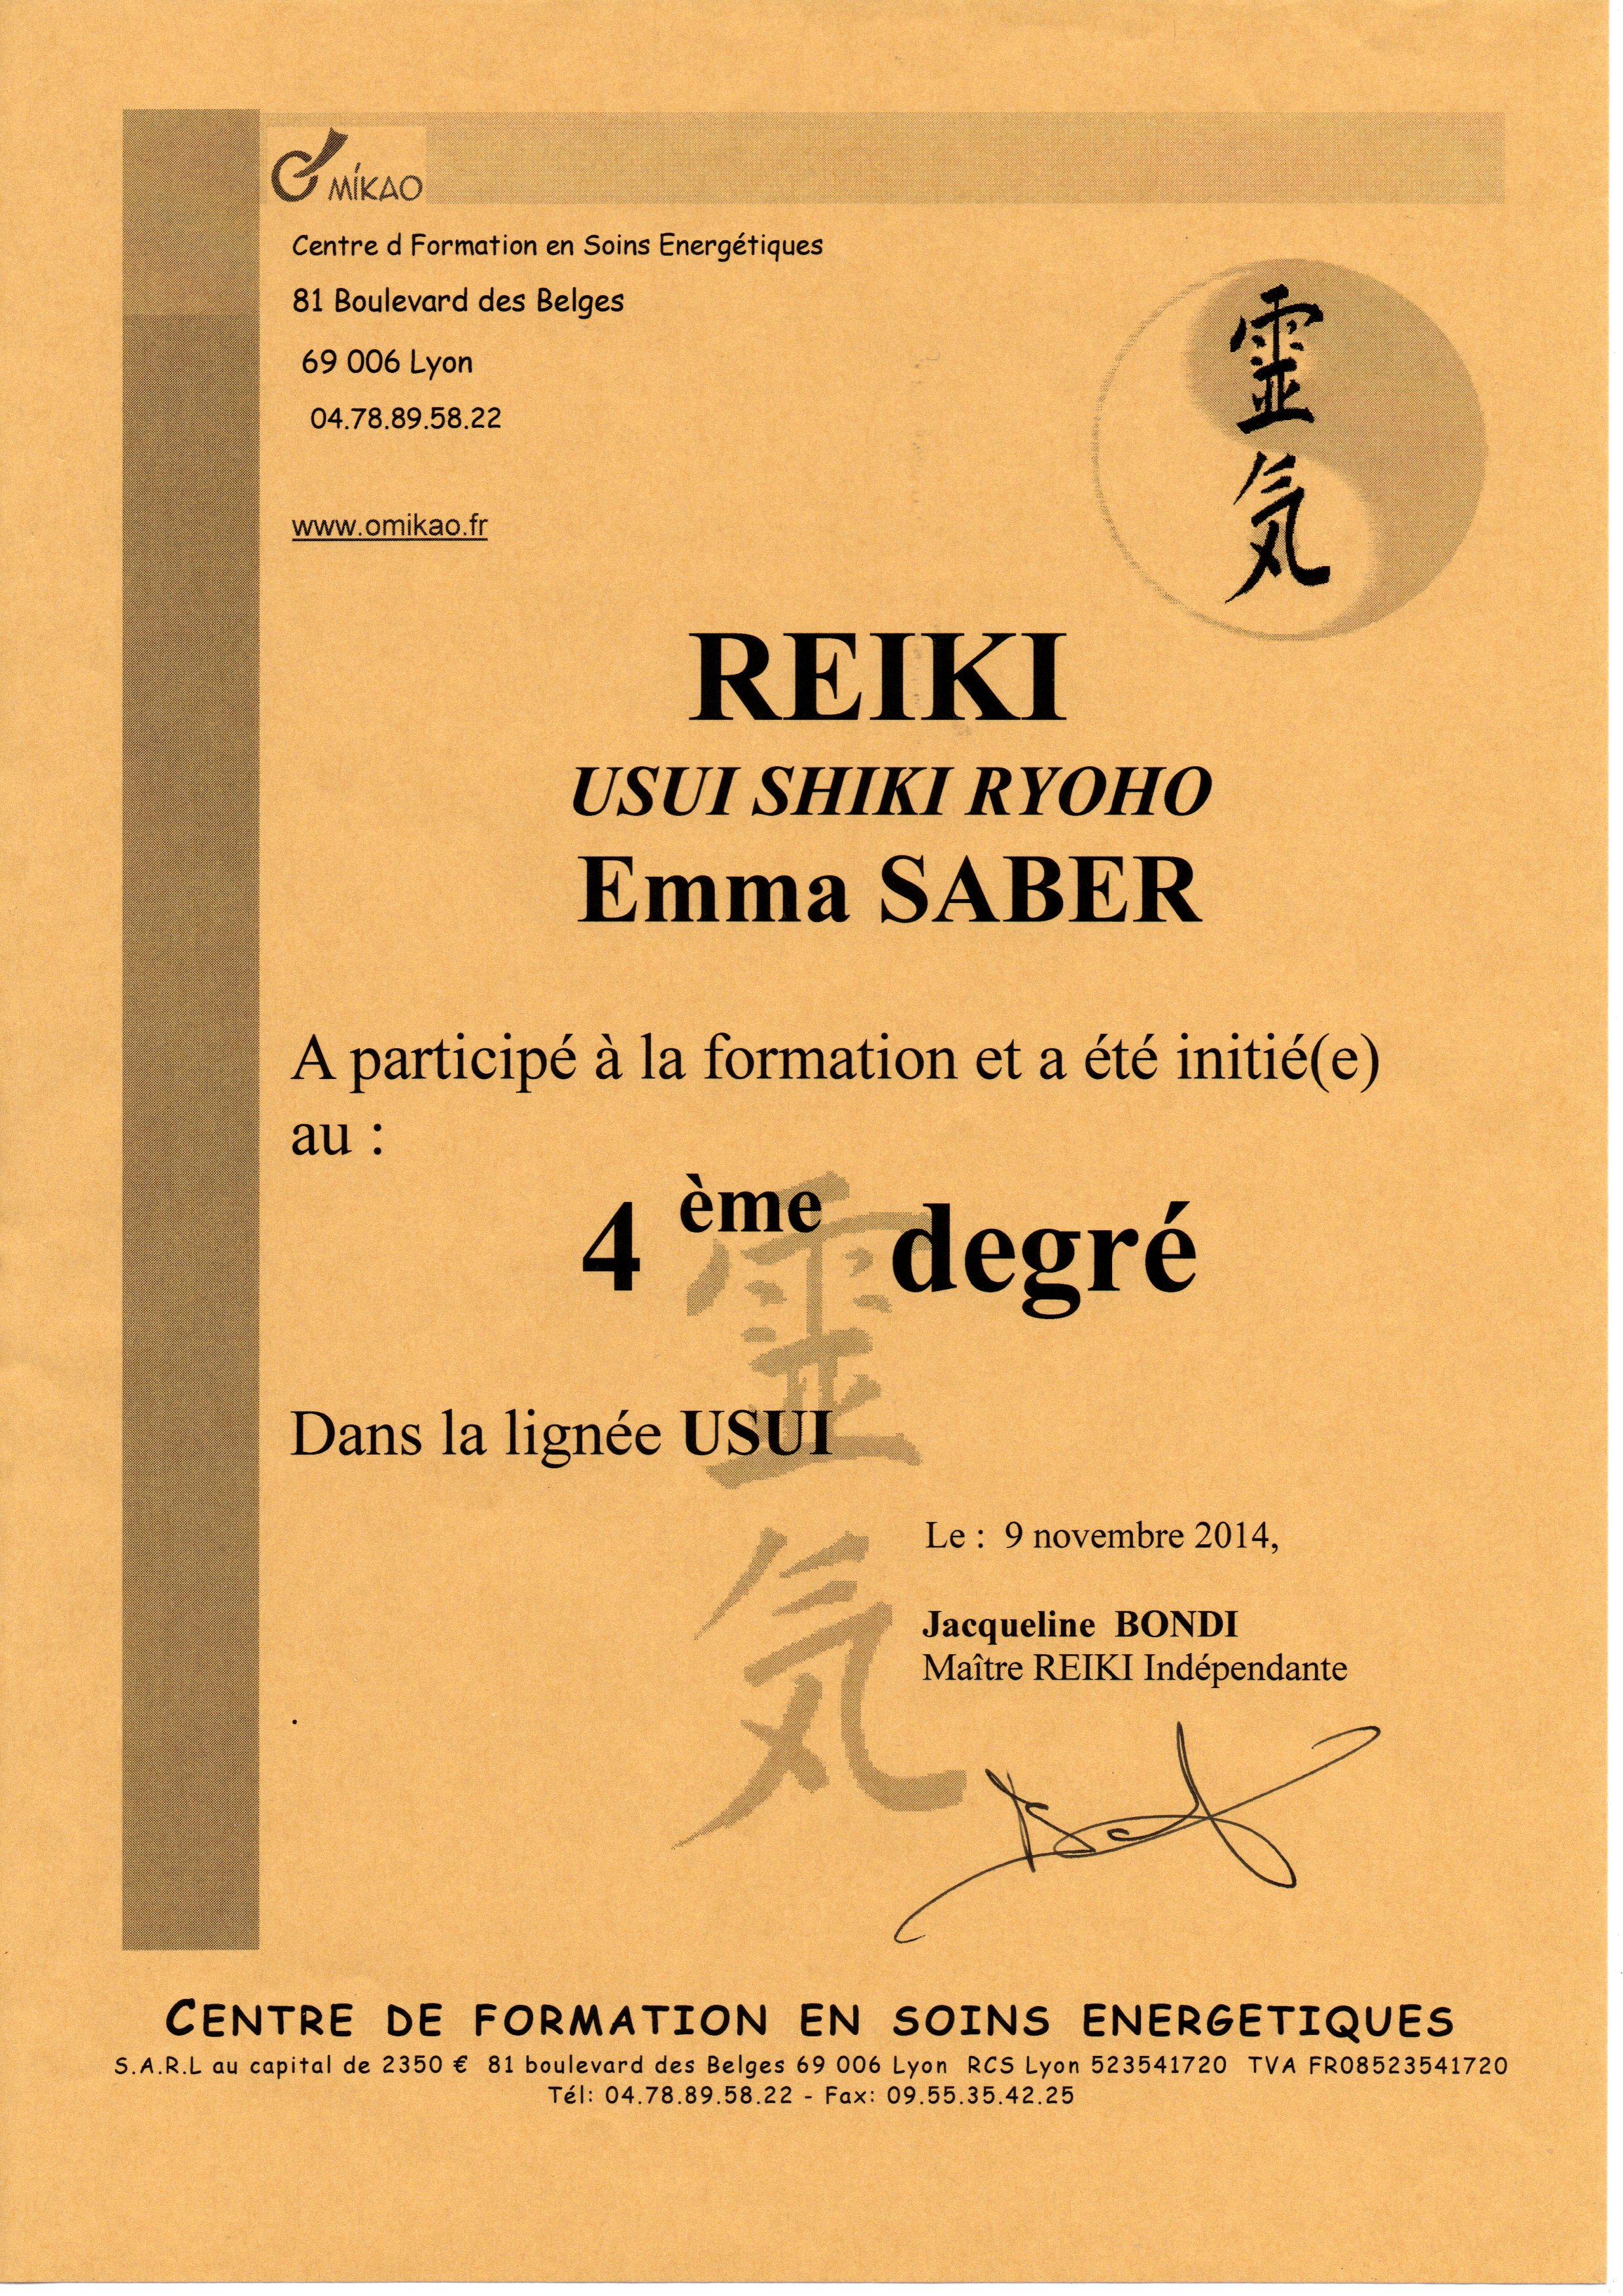 certificat-quatrieme-degre-reiki